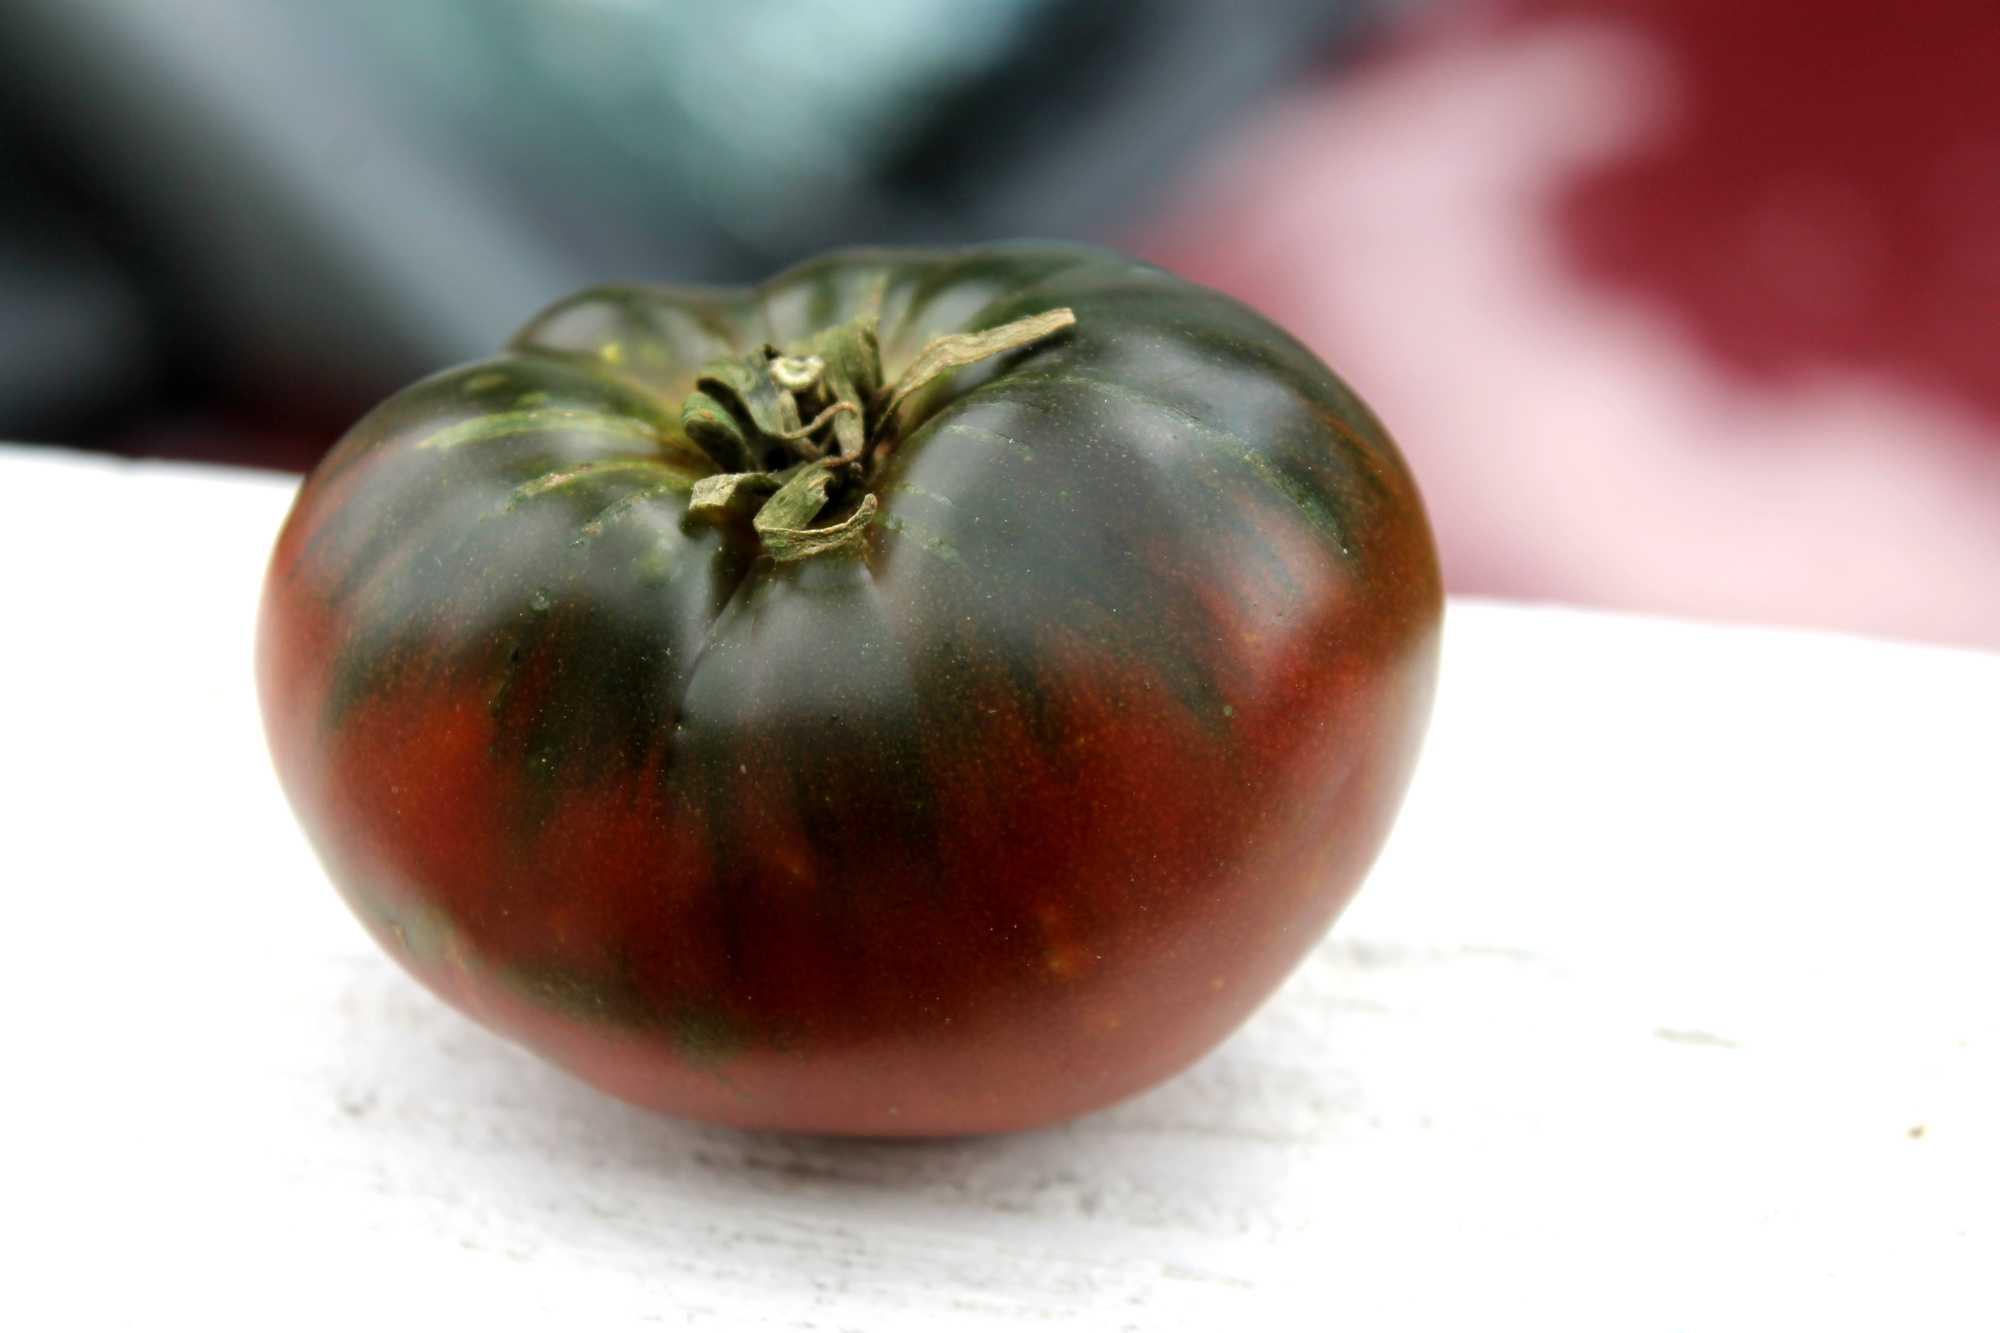 Black tomatoes photos